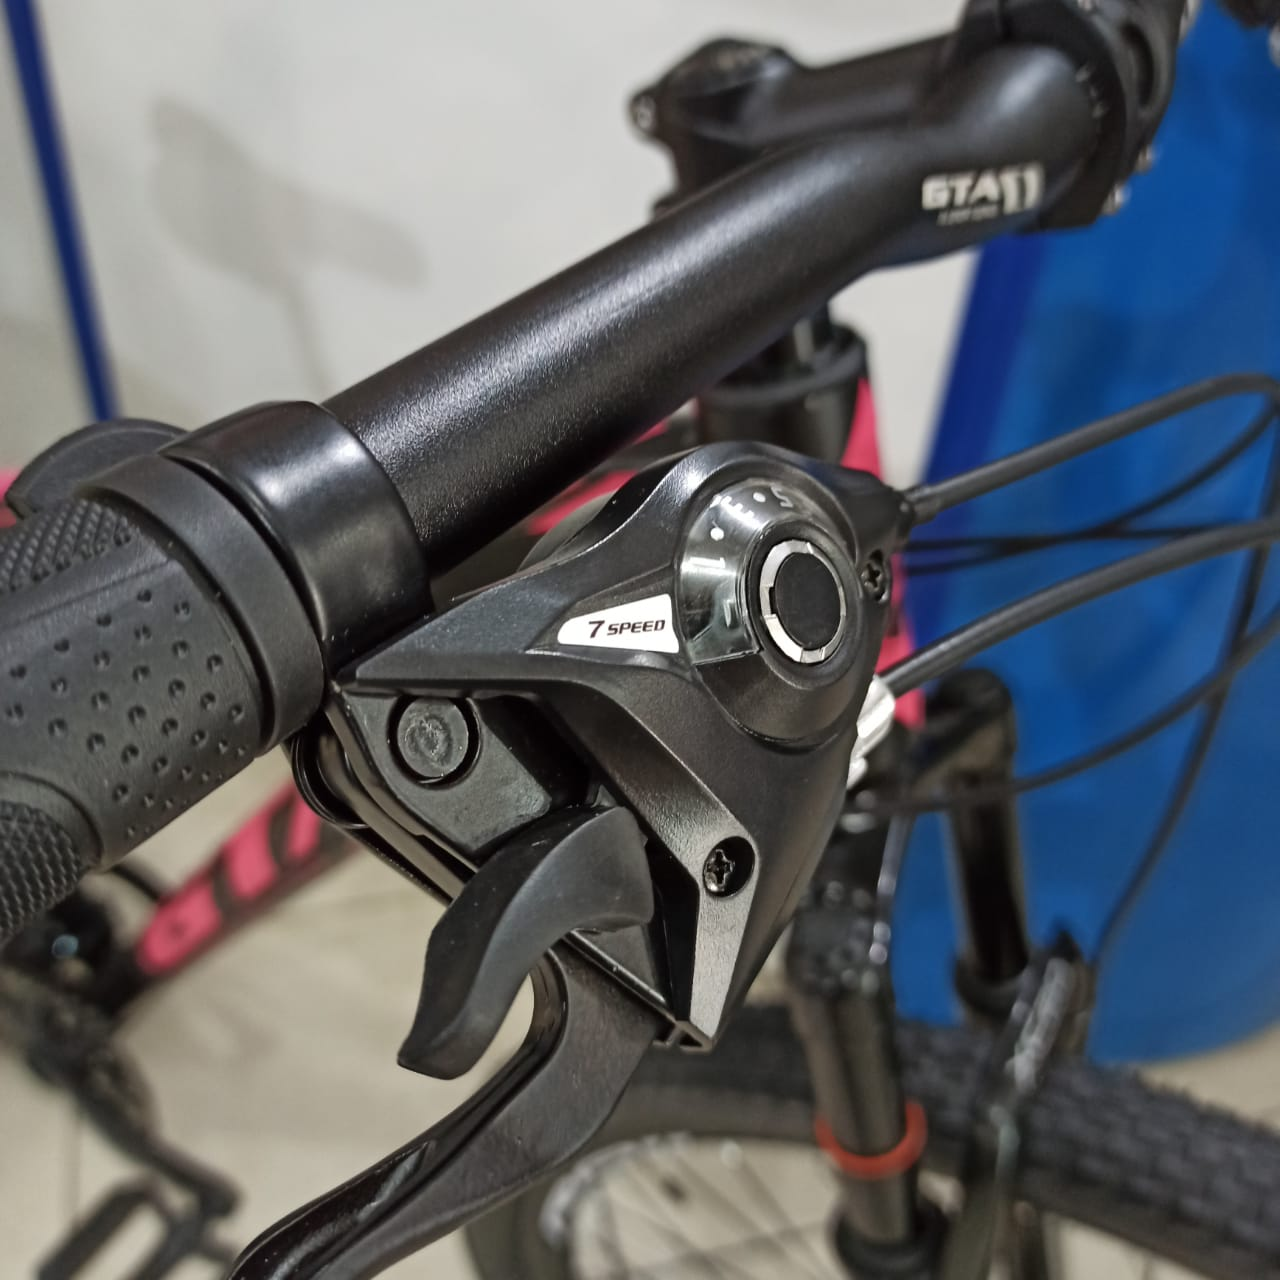 Bicicleta GTA NX11 aro 29 EDITAR